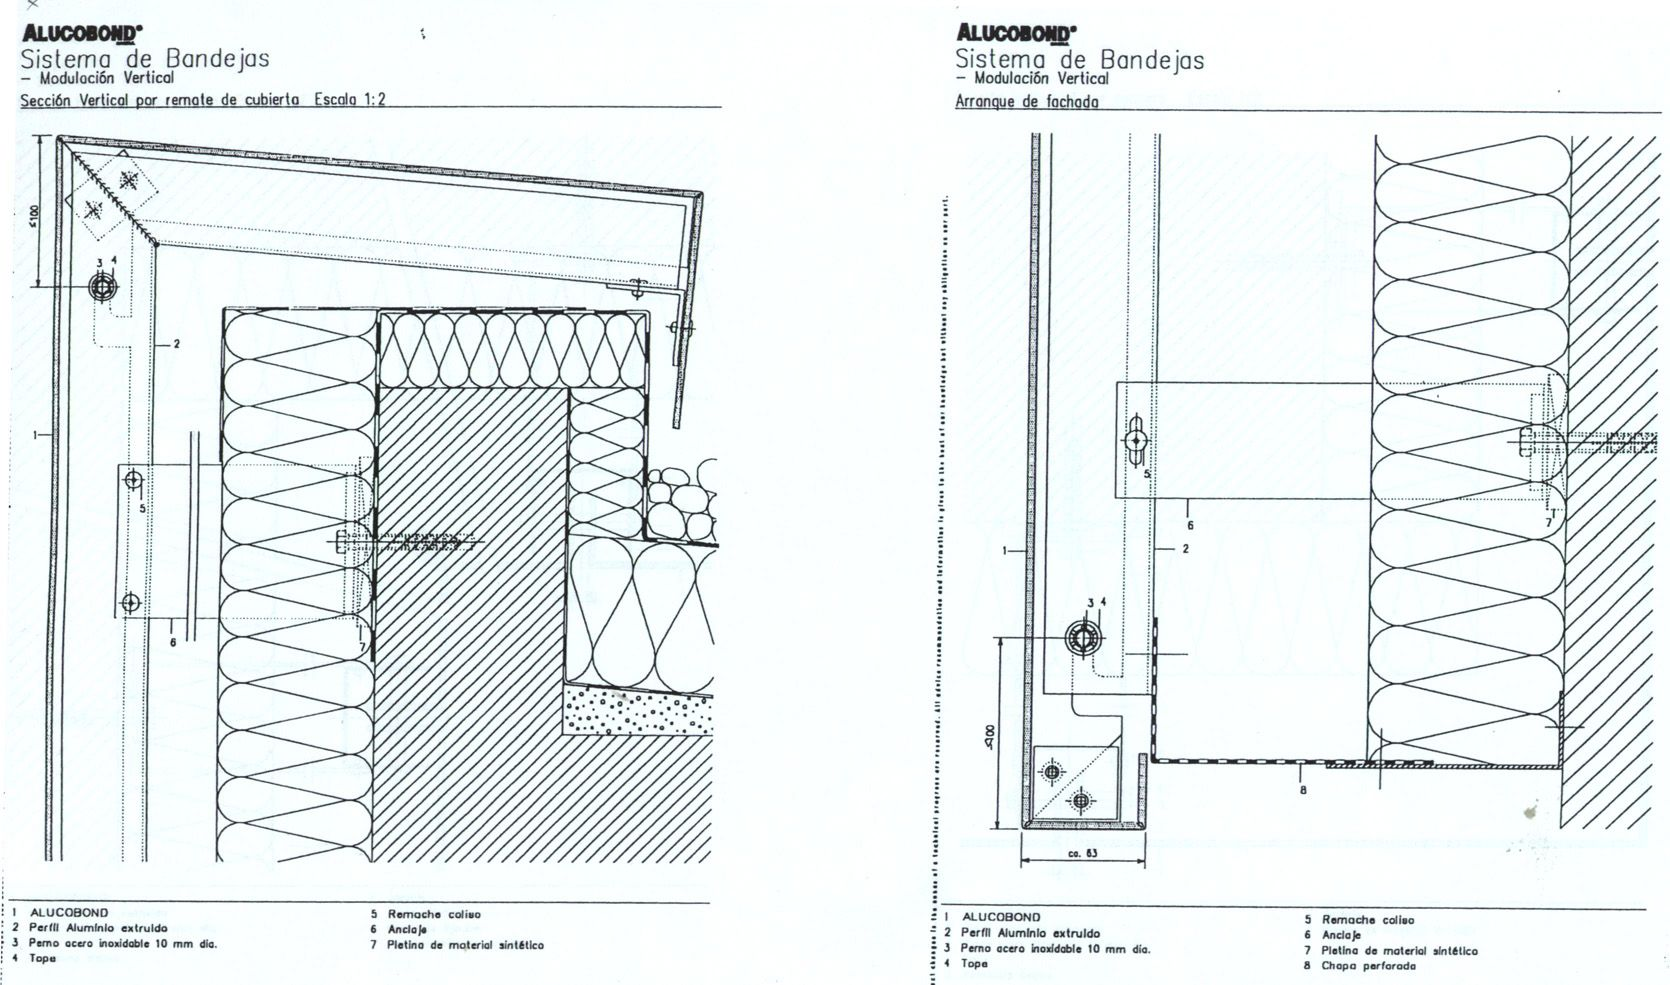 Aluminum Composite Panel Construction Detail : Xapametallica alucobondbandejacubierta